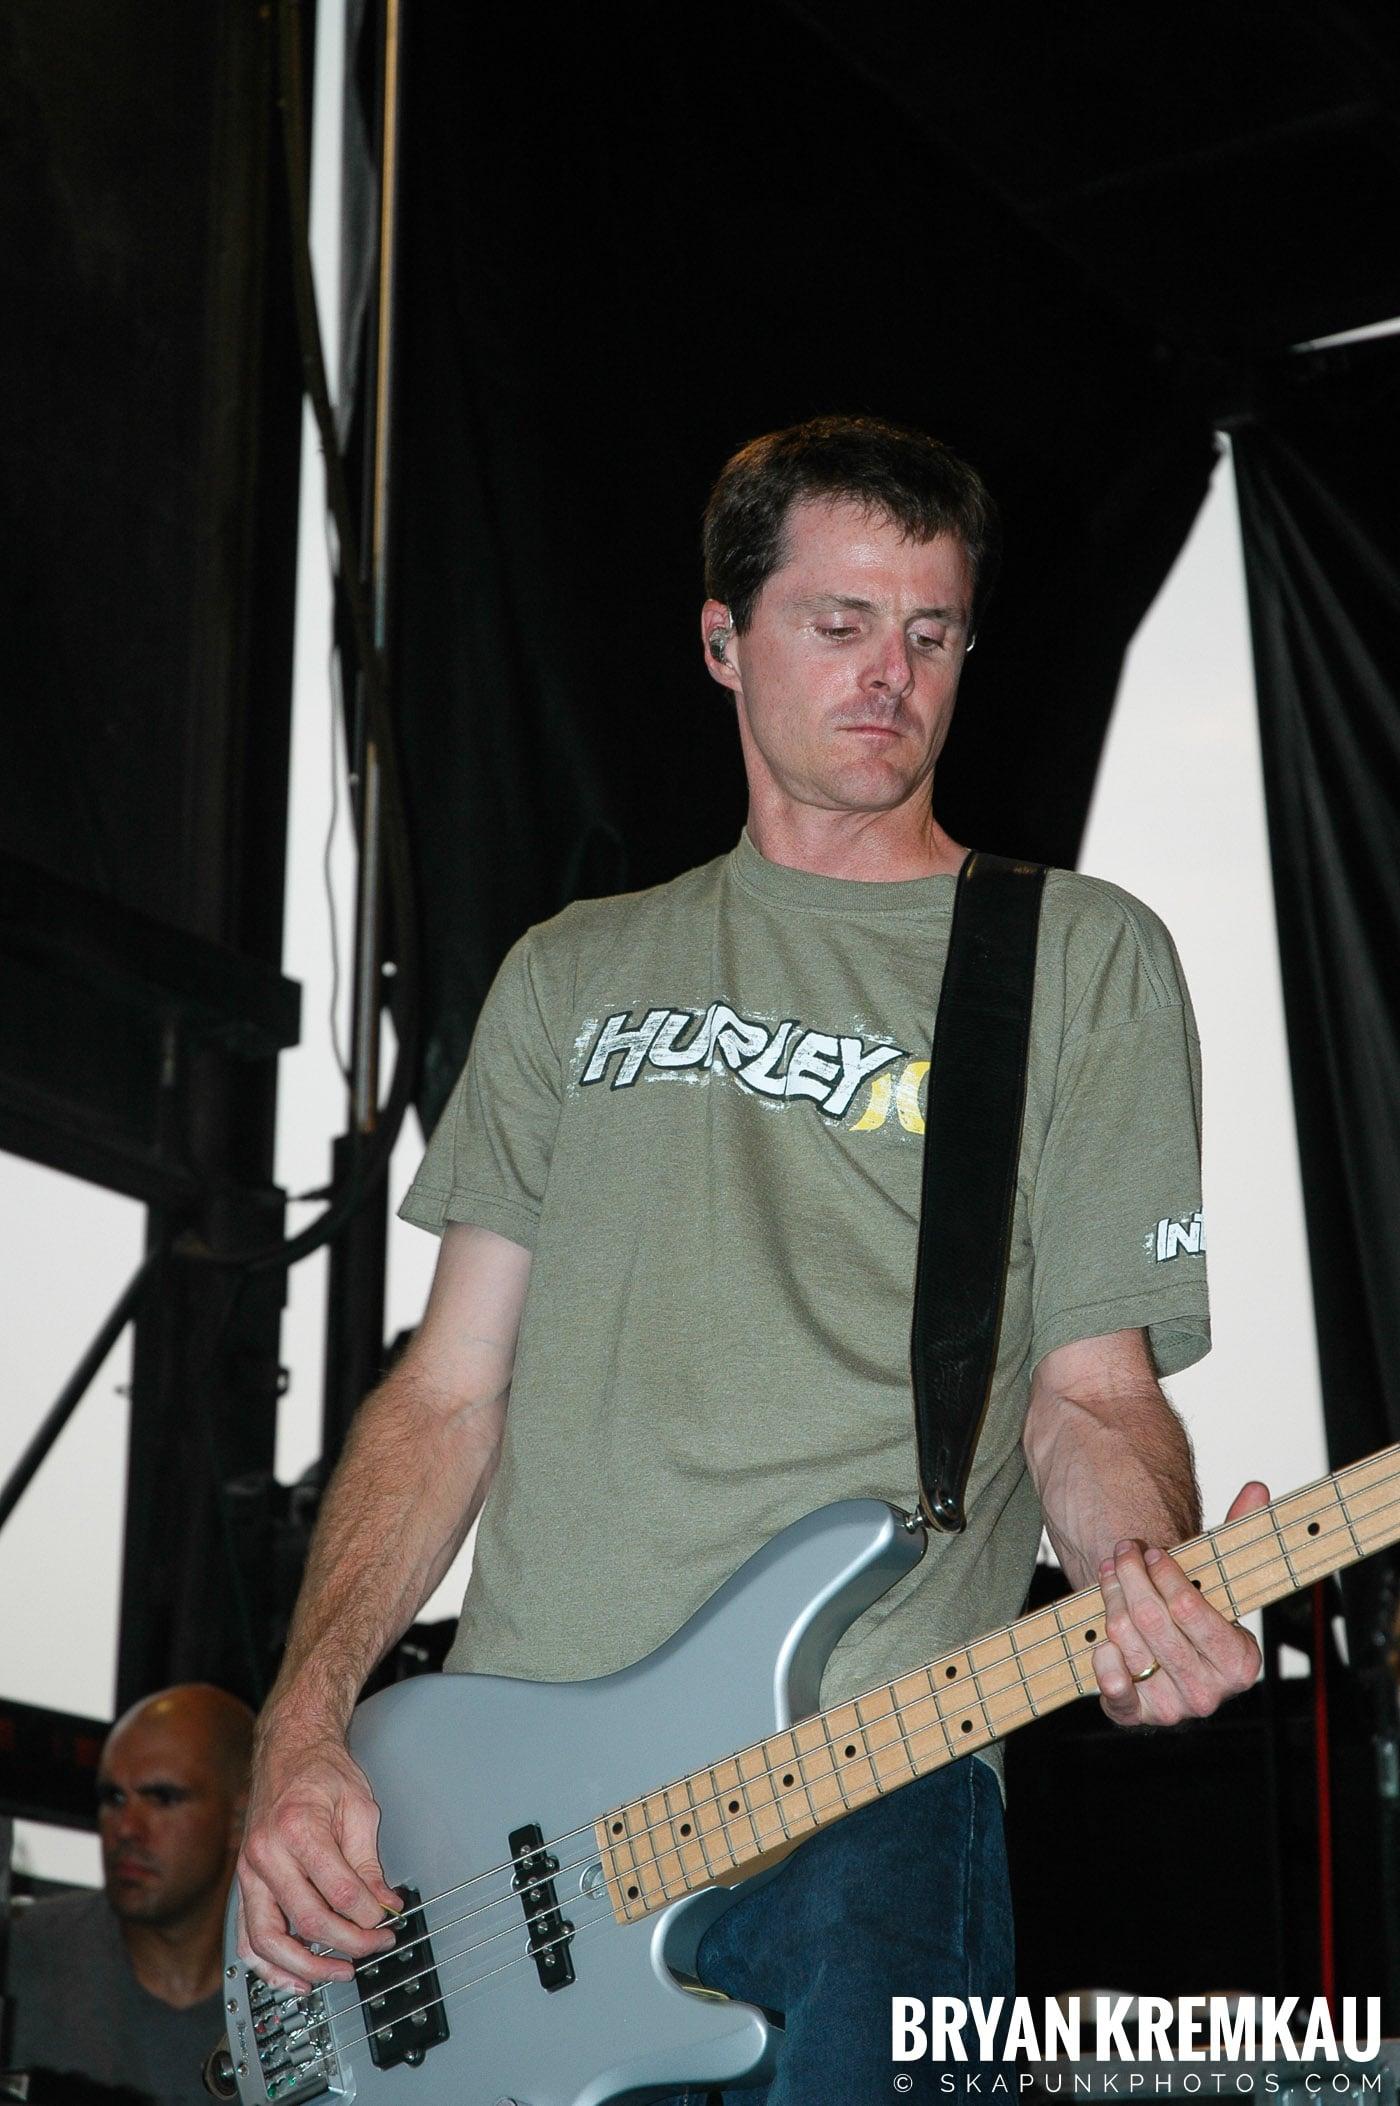 The Offspring @ Warped Tour 05, NYC - 8.12.05 (4)